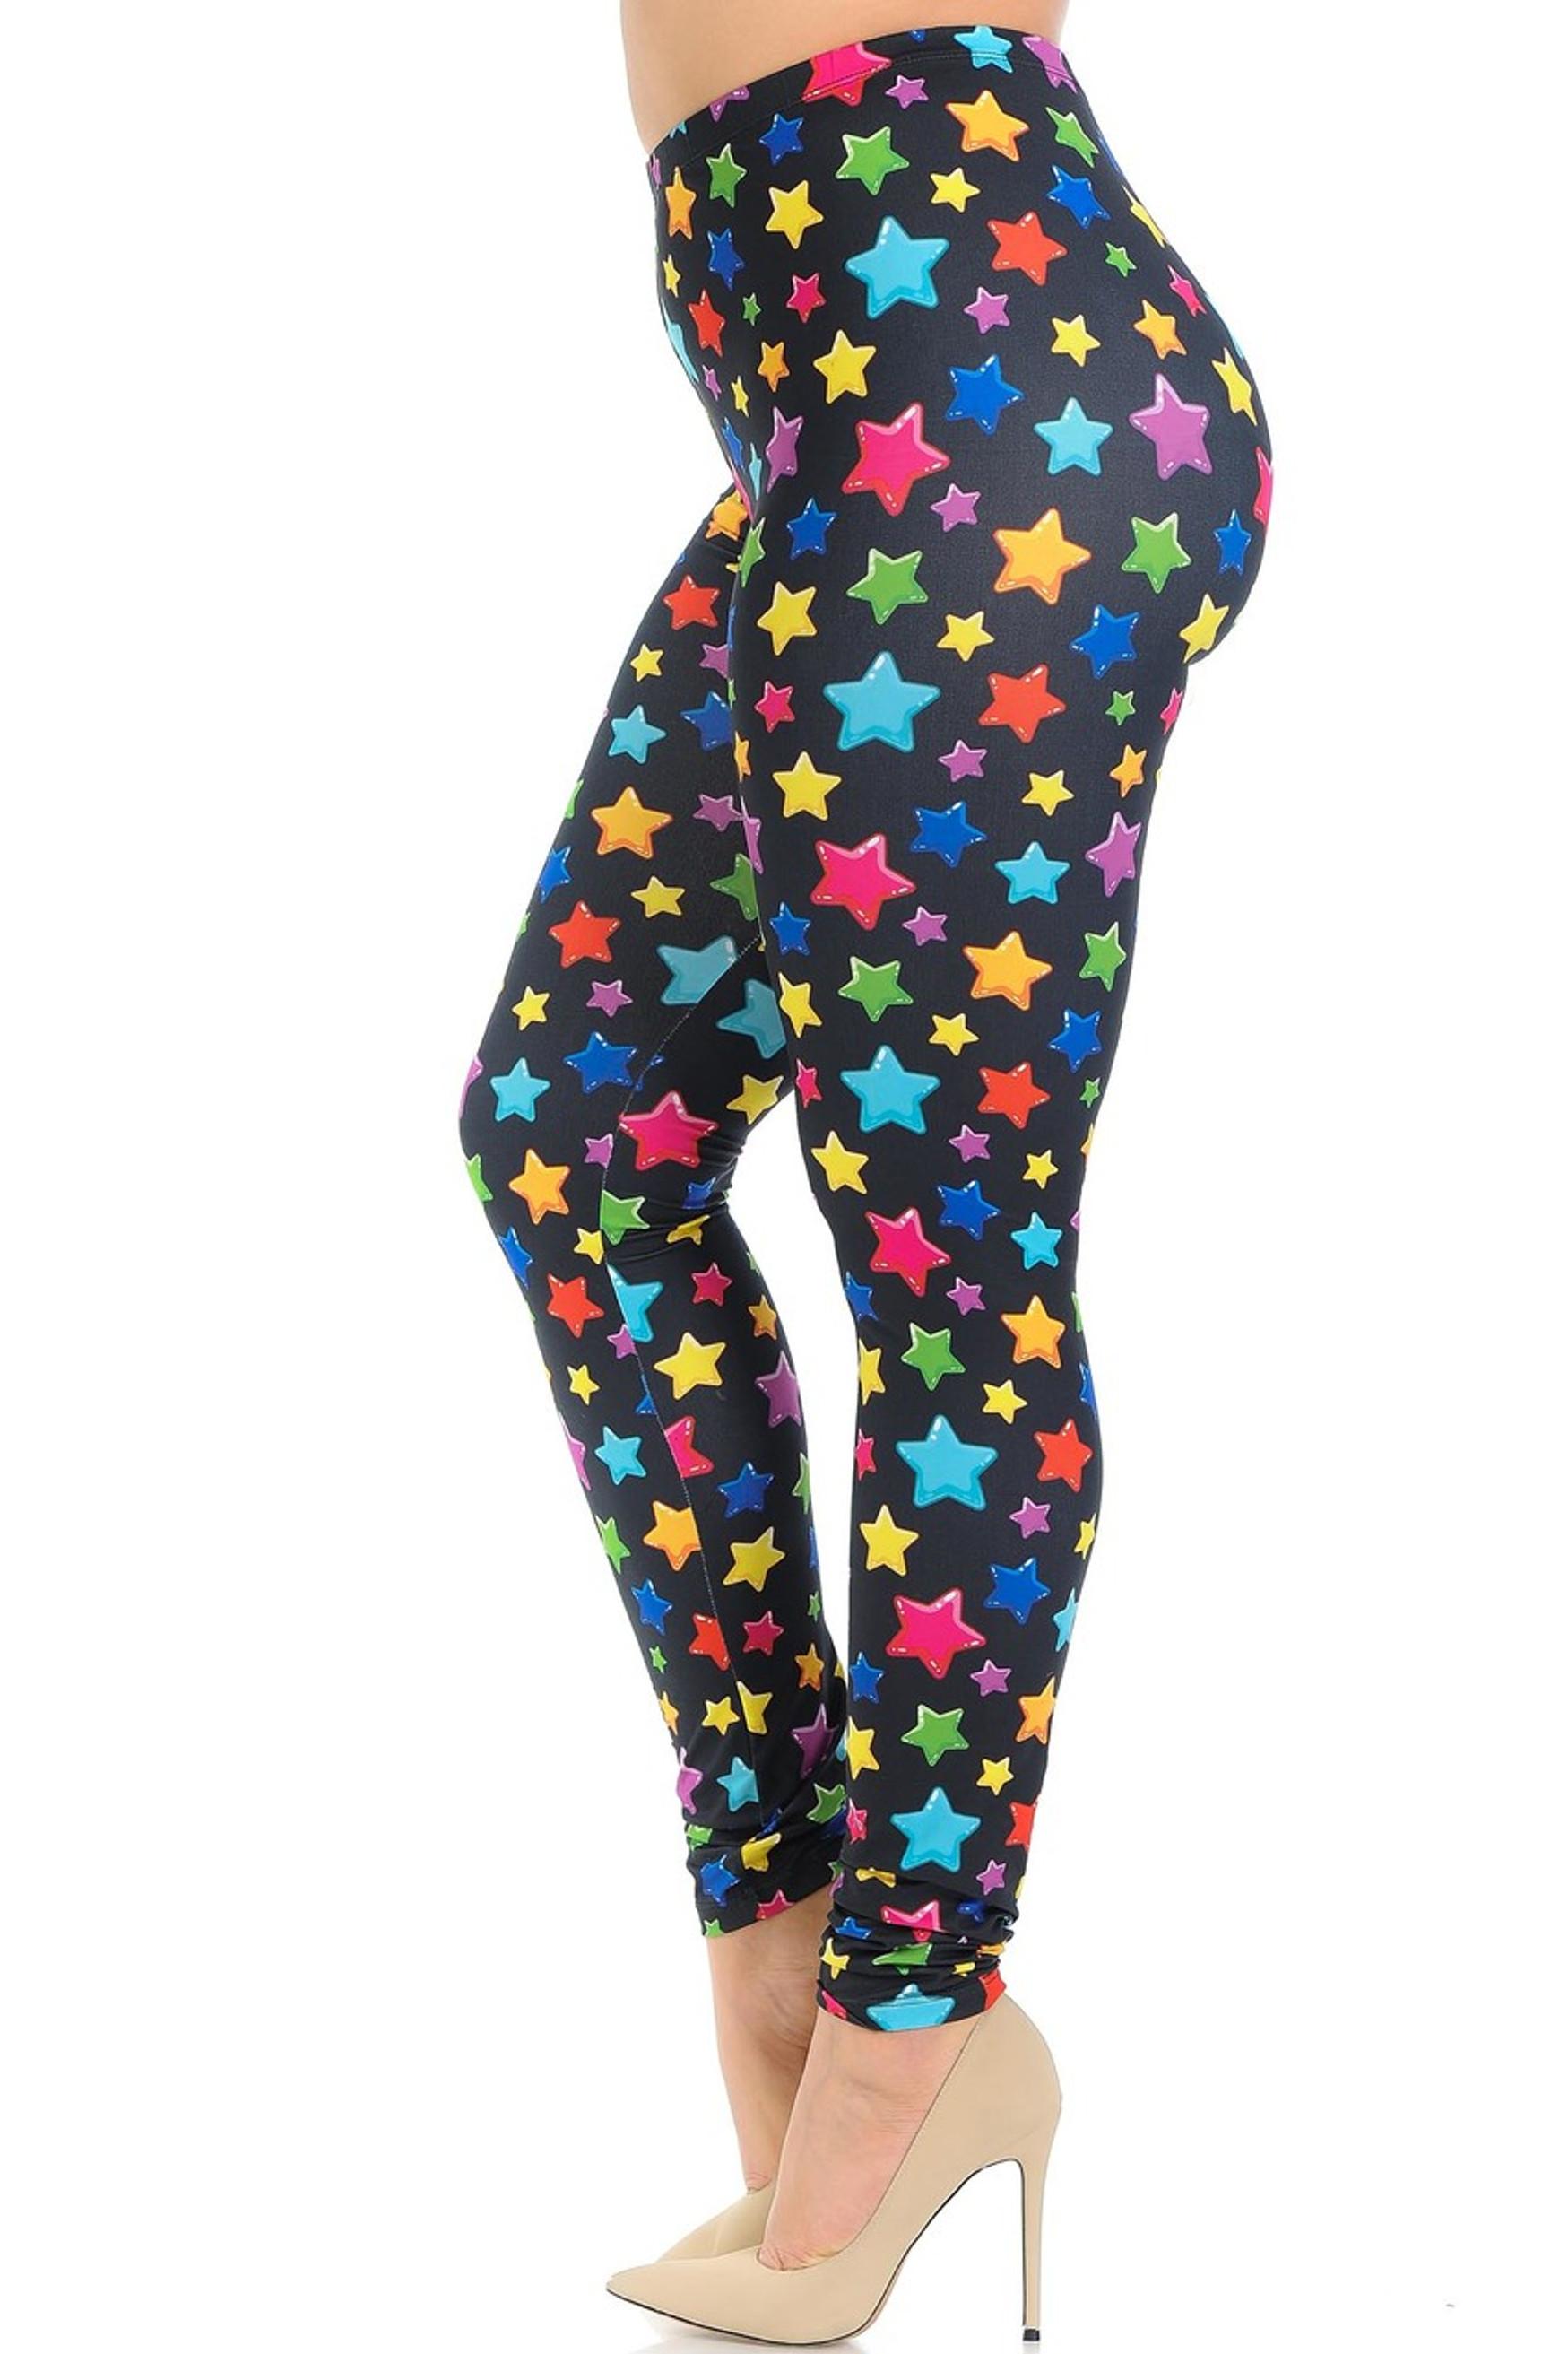 Creamy Soft Colorful Cartoon Stars Plus Size Leggings - Signature Collection